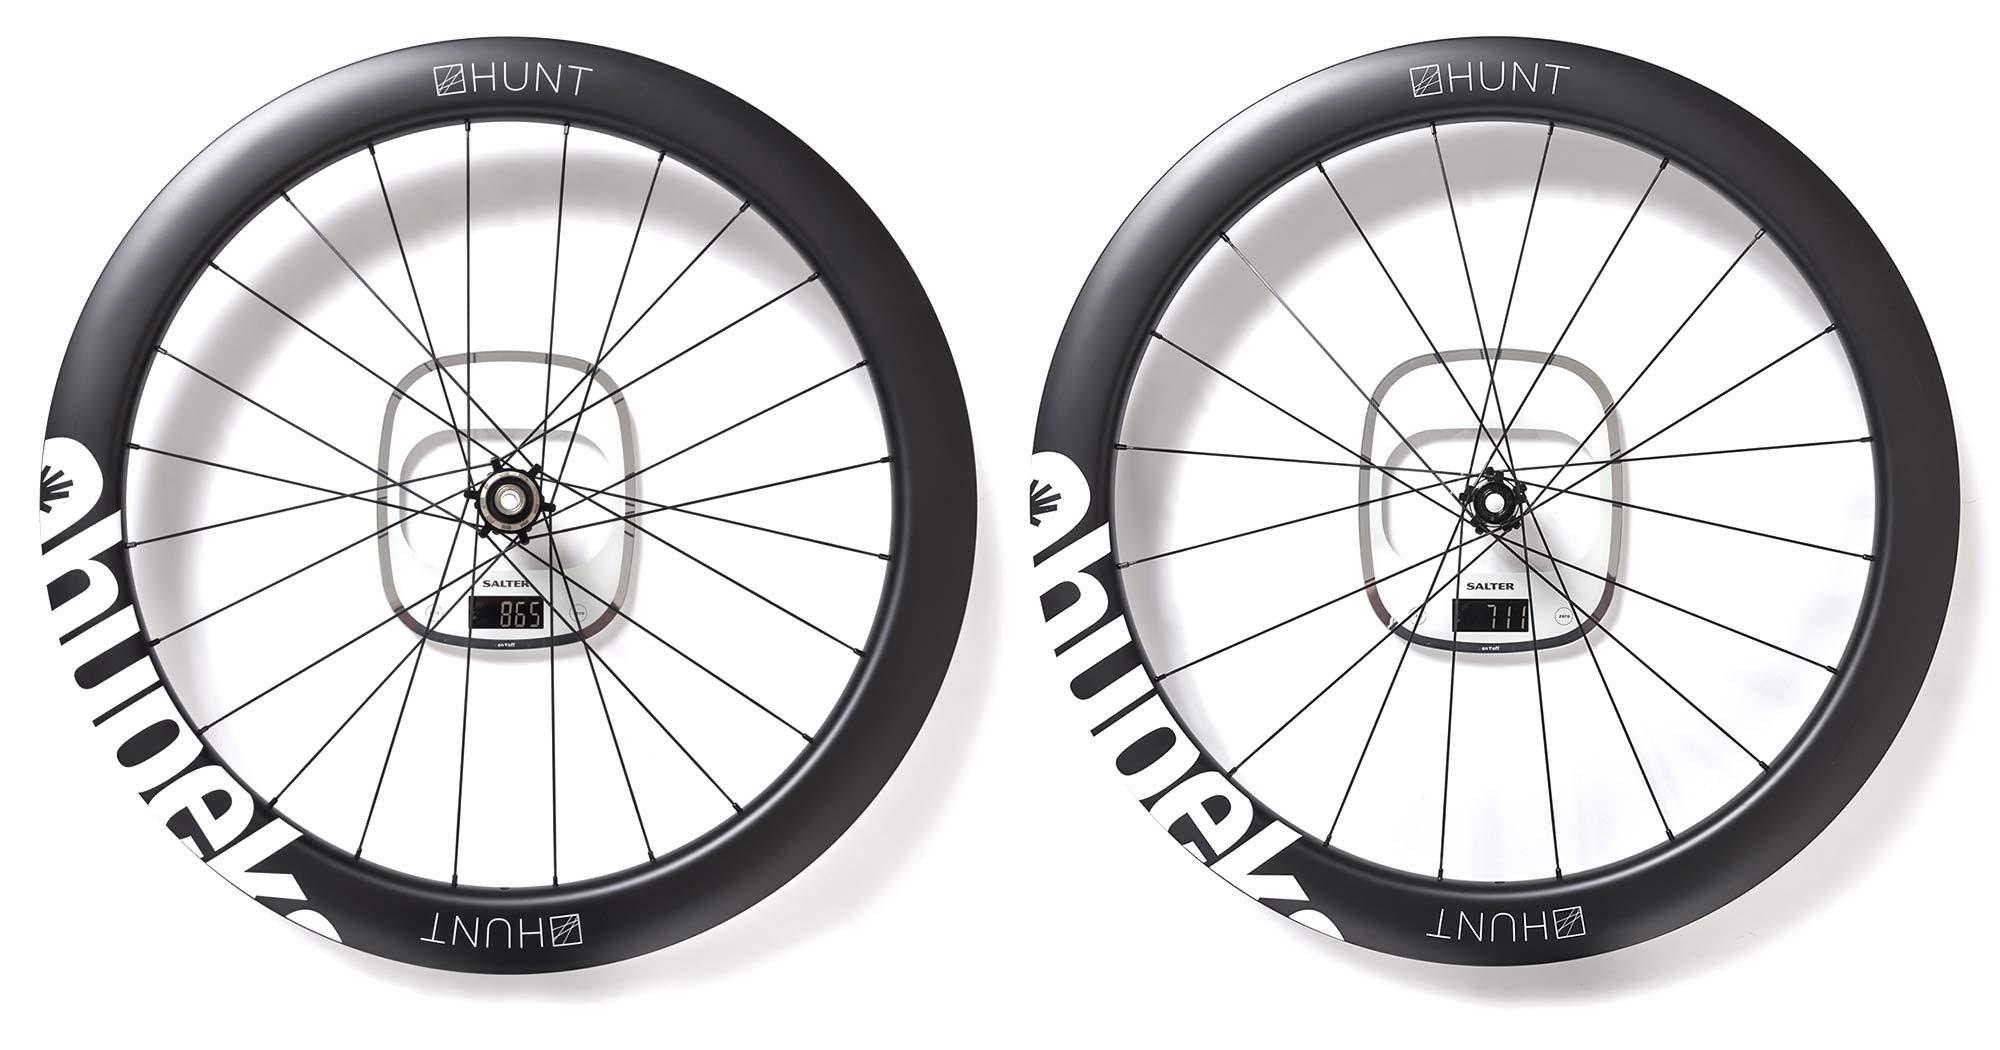 Qhubeka x Hunt 54 Aerodynamicist Carbon Disc wheels, Tour de France-raced tubeless carbon aero road wheels for charity, 1576g actual weight